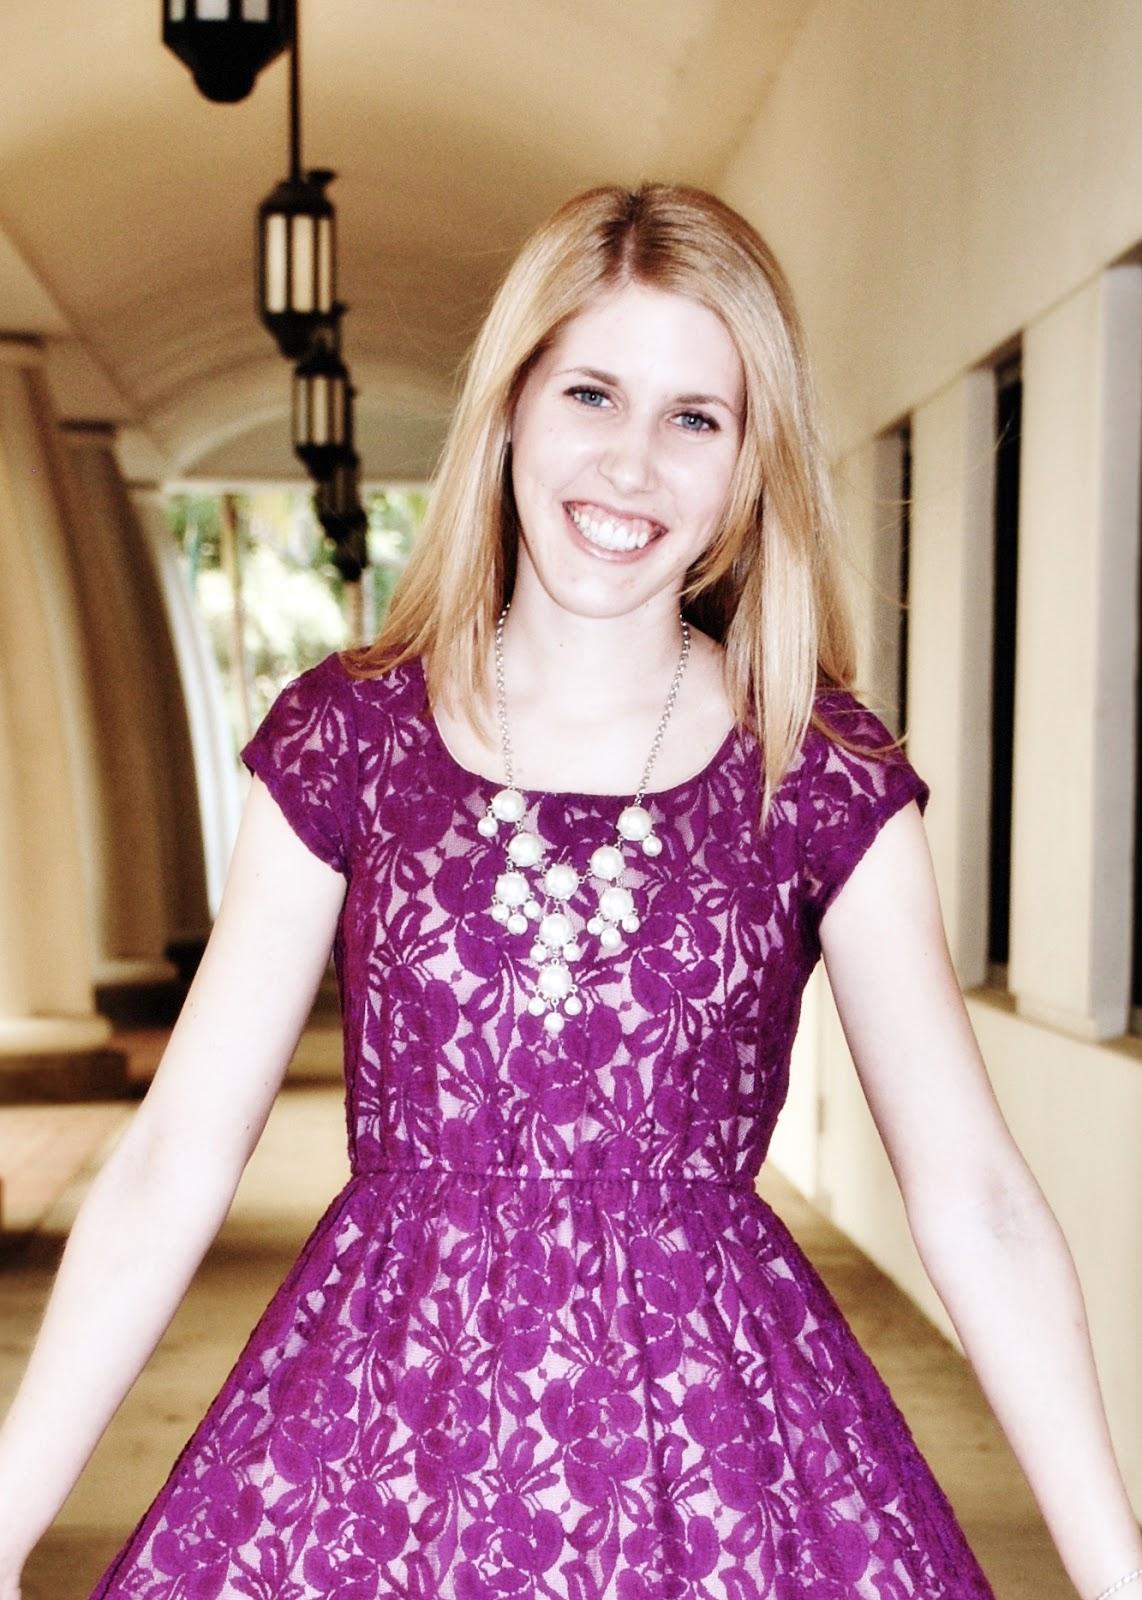 Sonja Model Nonude Overblog | Damn Its Hotz